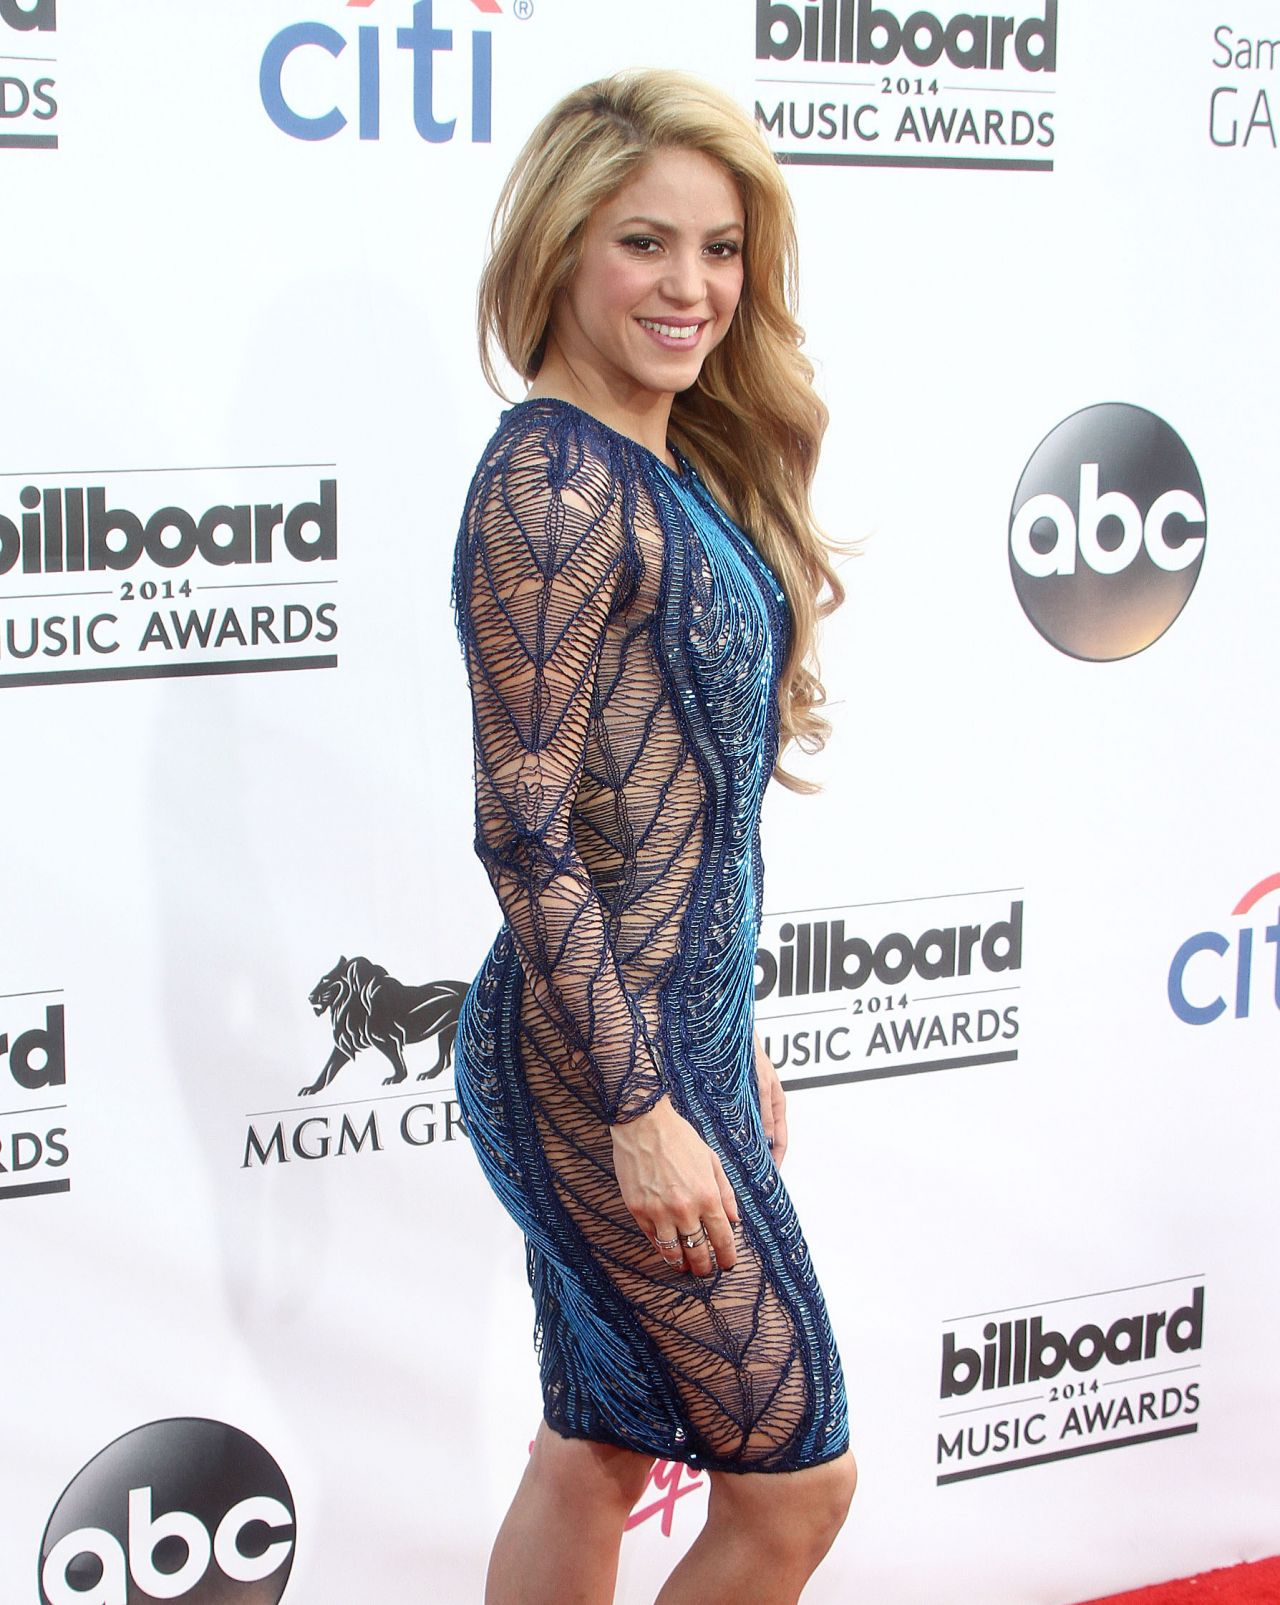 Shakira Wearing Julien Macdonald Dress - 2014 Billboard Music Awards ...